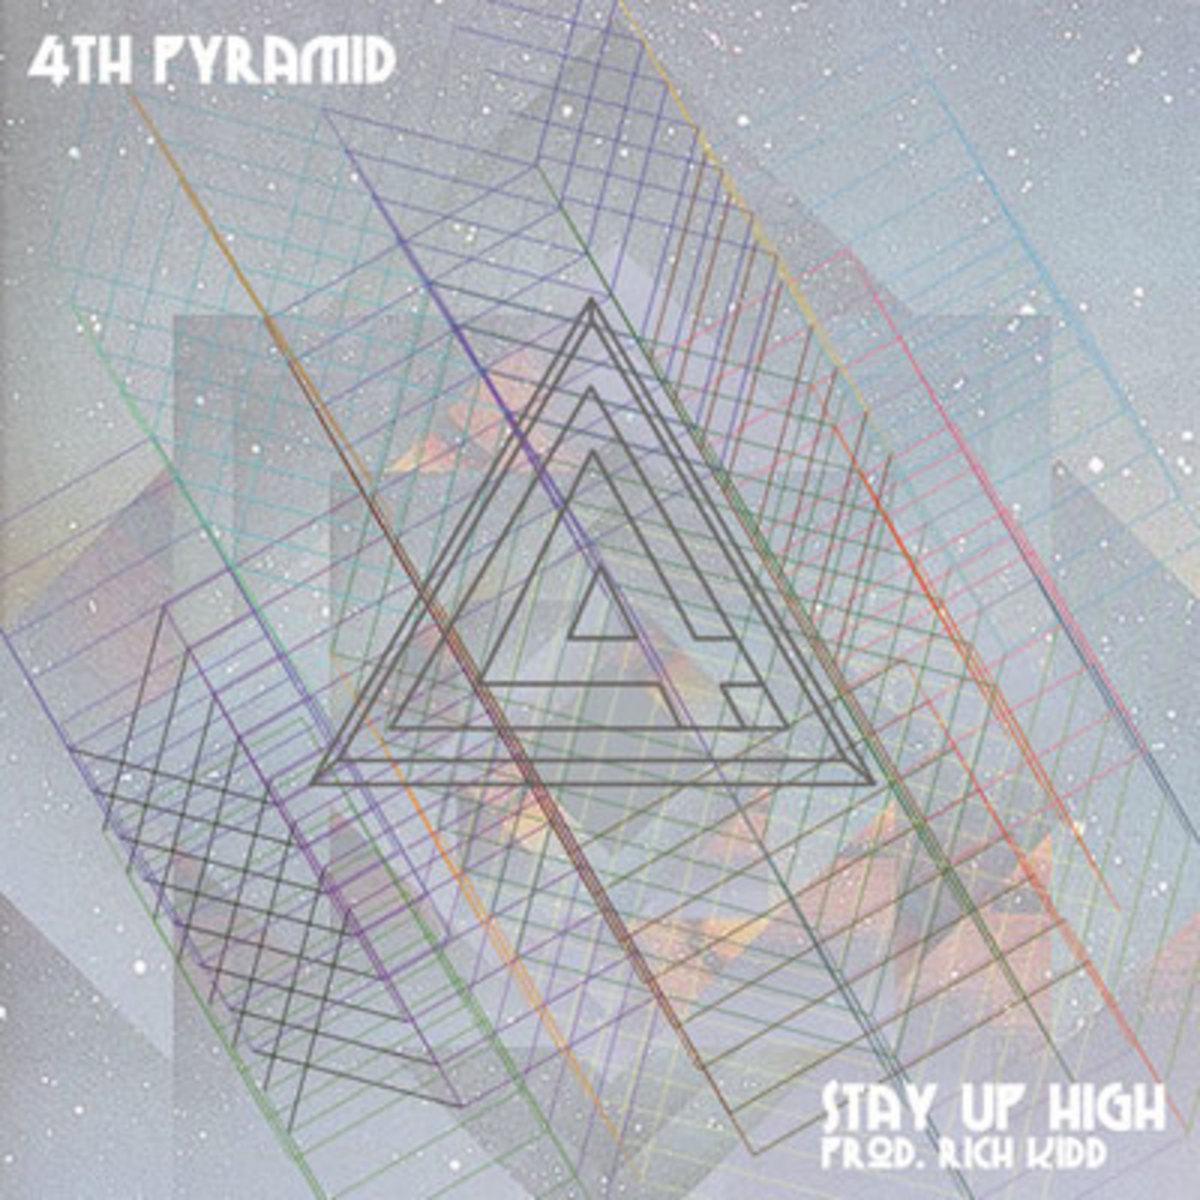 4thpyramid-stayuphigh.jpg